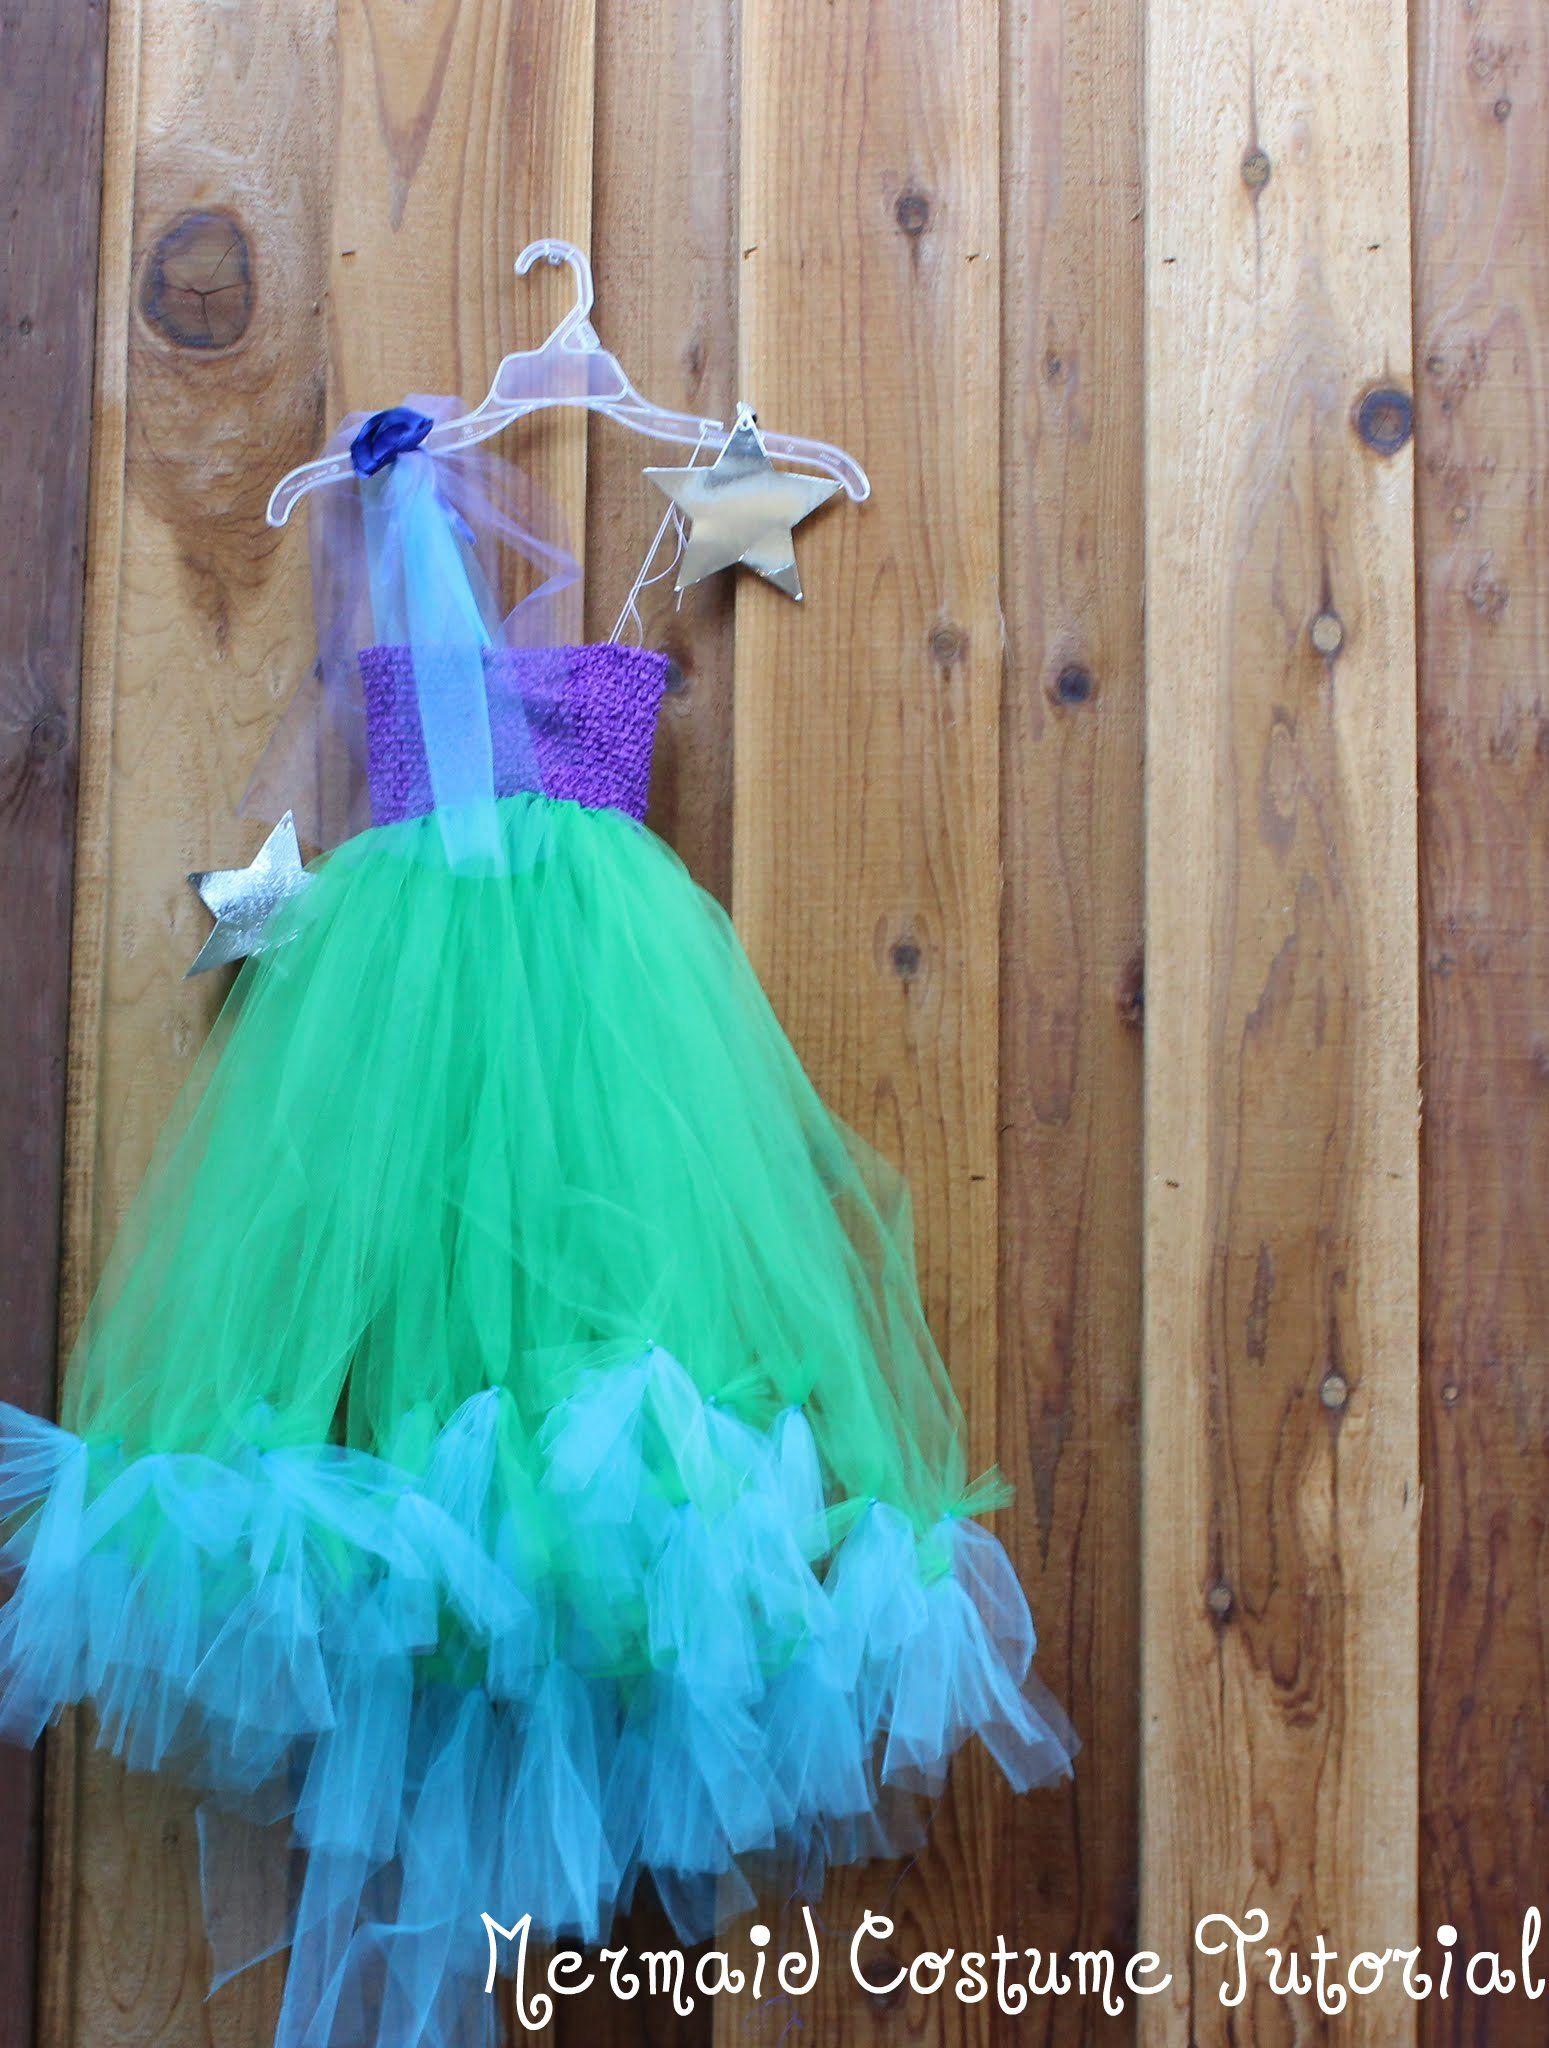 No Sew Mermaid Costume DIY Tutorial | Princess Allie\'s tea party ...